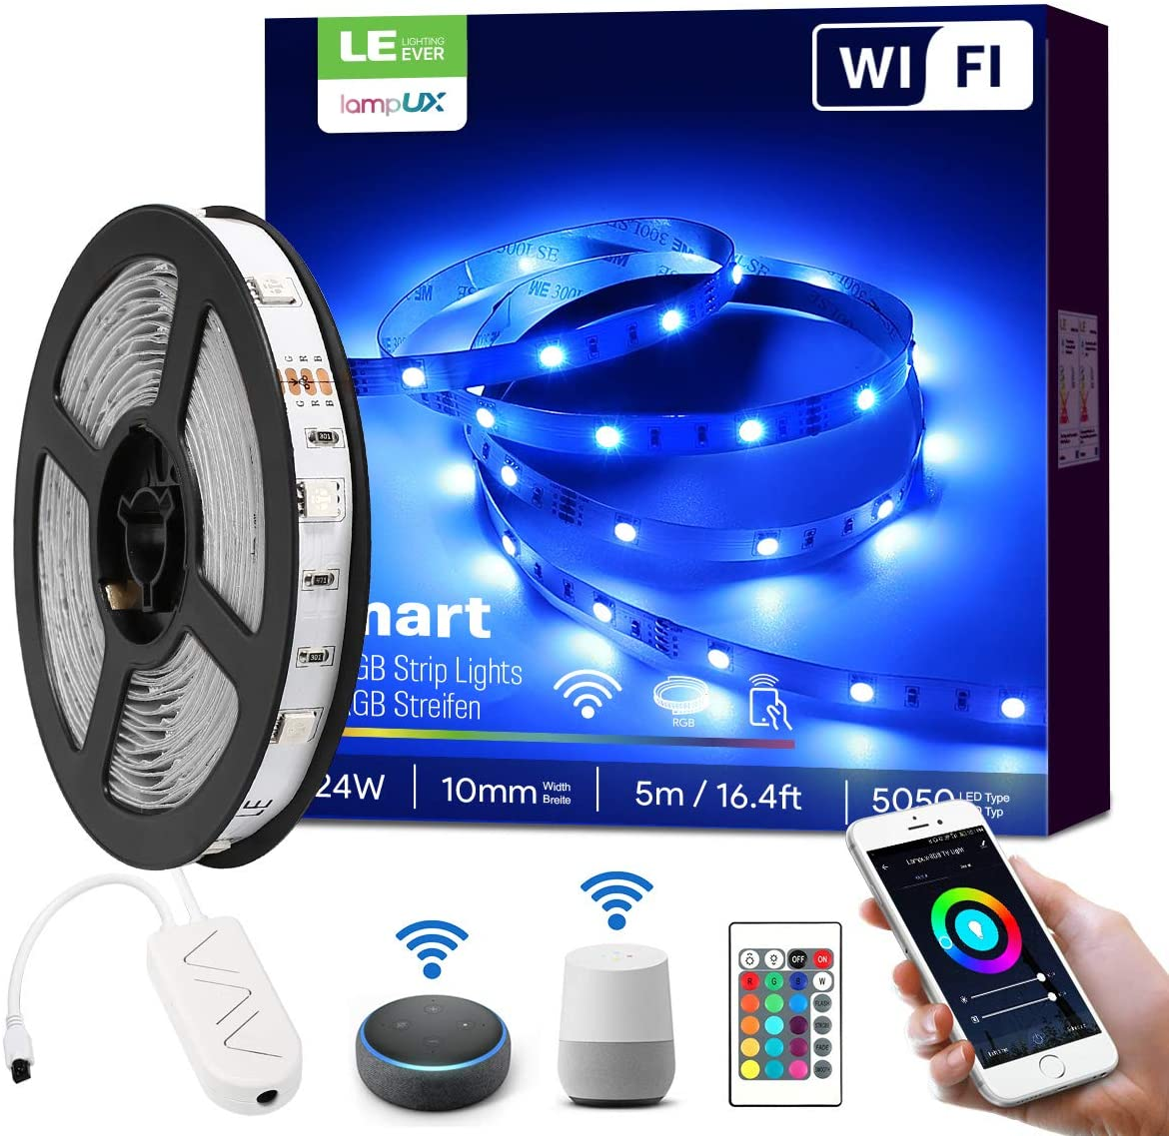 LE LampUX WiFi Smart LED Strip Lights with Remote, Alexa Google Home Compatible, 16.4ft RGB Color Changing, SMD 5050 LED Rope Light, Under Cabinet Strip Lighting, 12V Tape Light for Kitchen, Bedroom